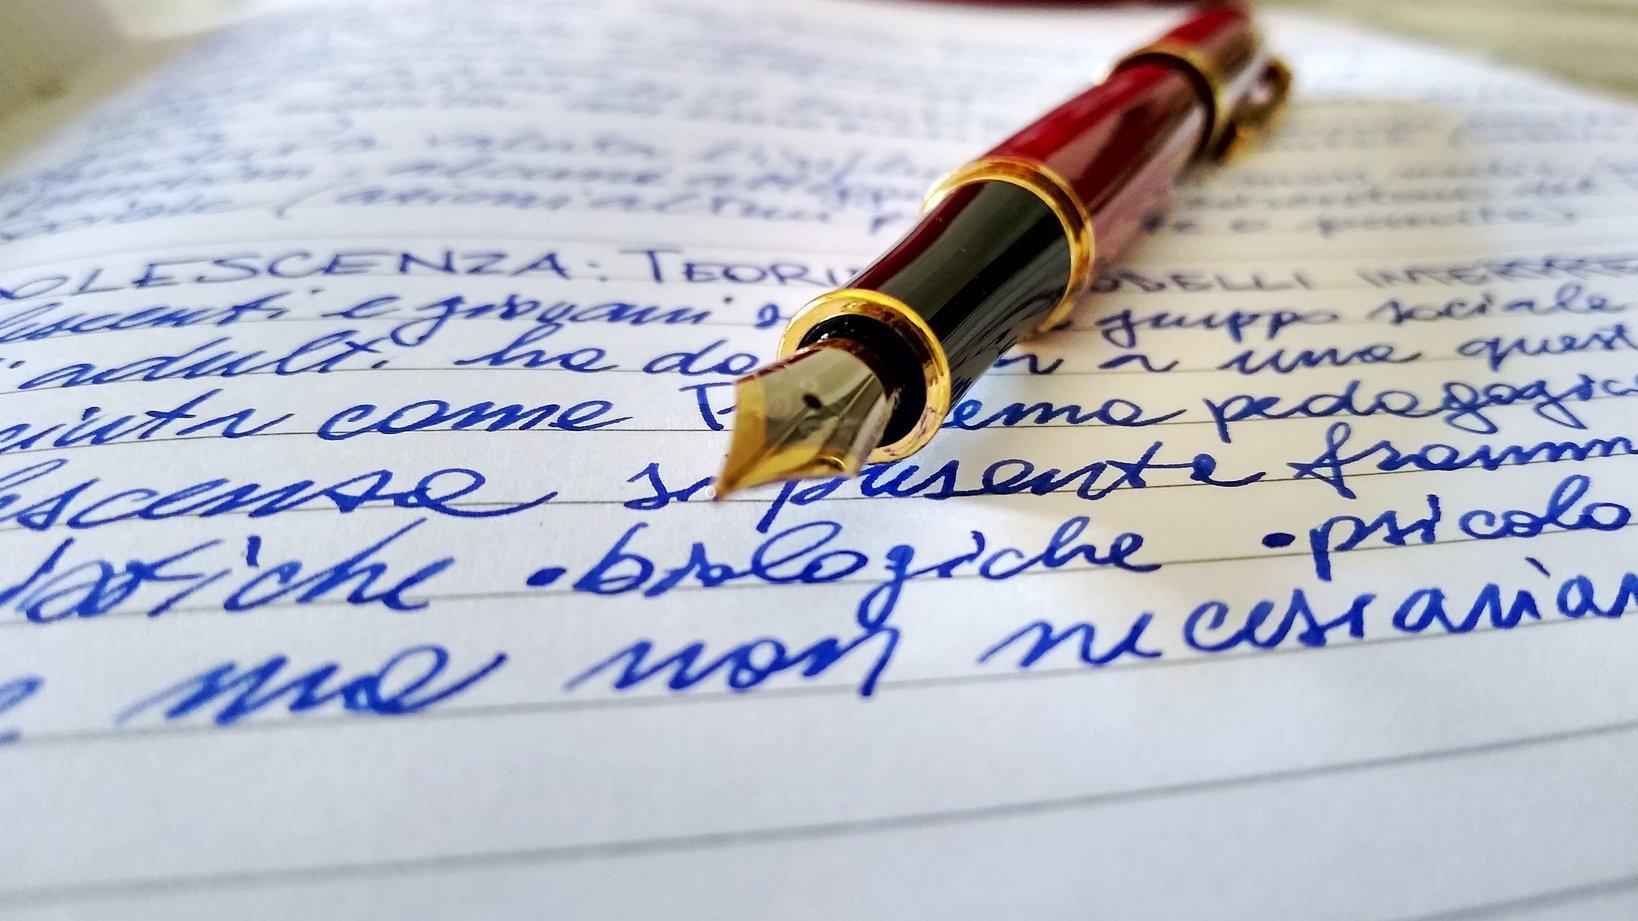 Bella Scrittura | Penne stilografiche. Una collezione esclusiva - Bella  Scrittura